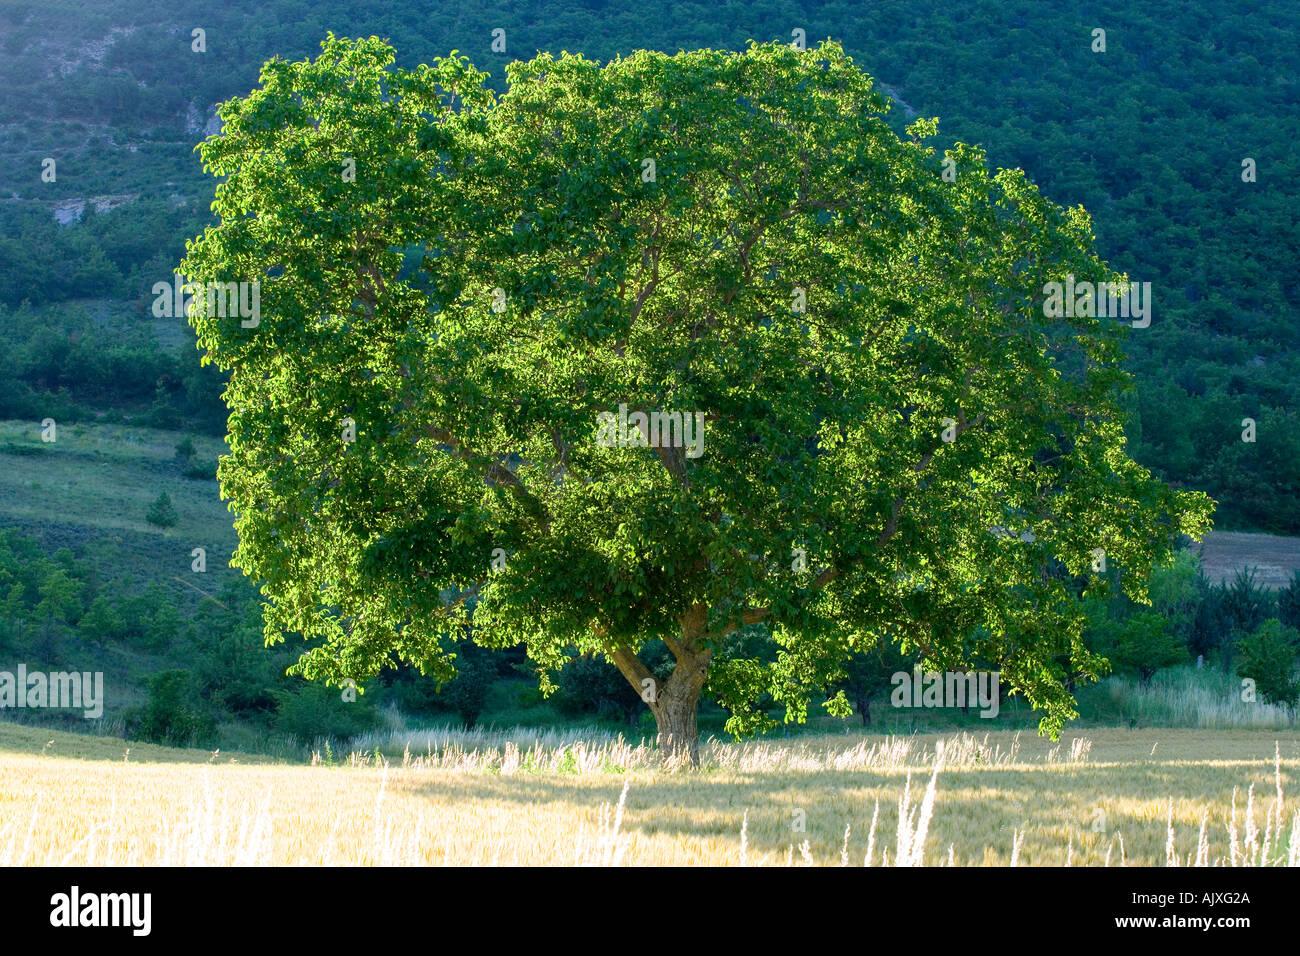 Tree in wheat field France - Stock Image